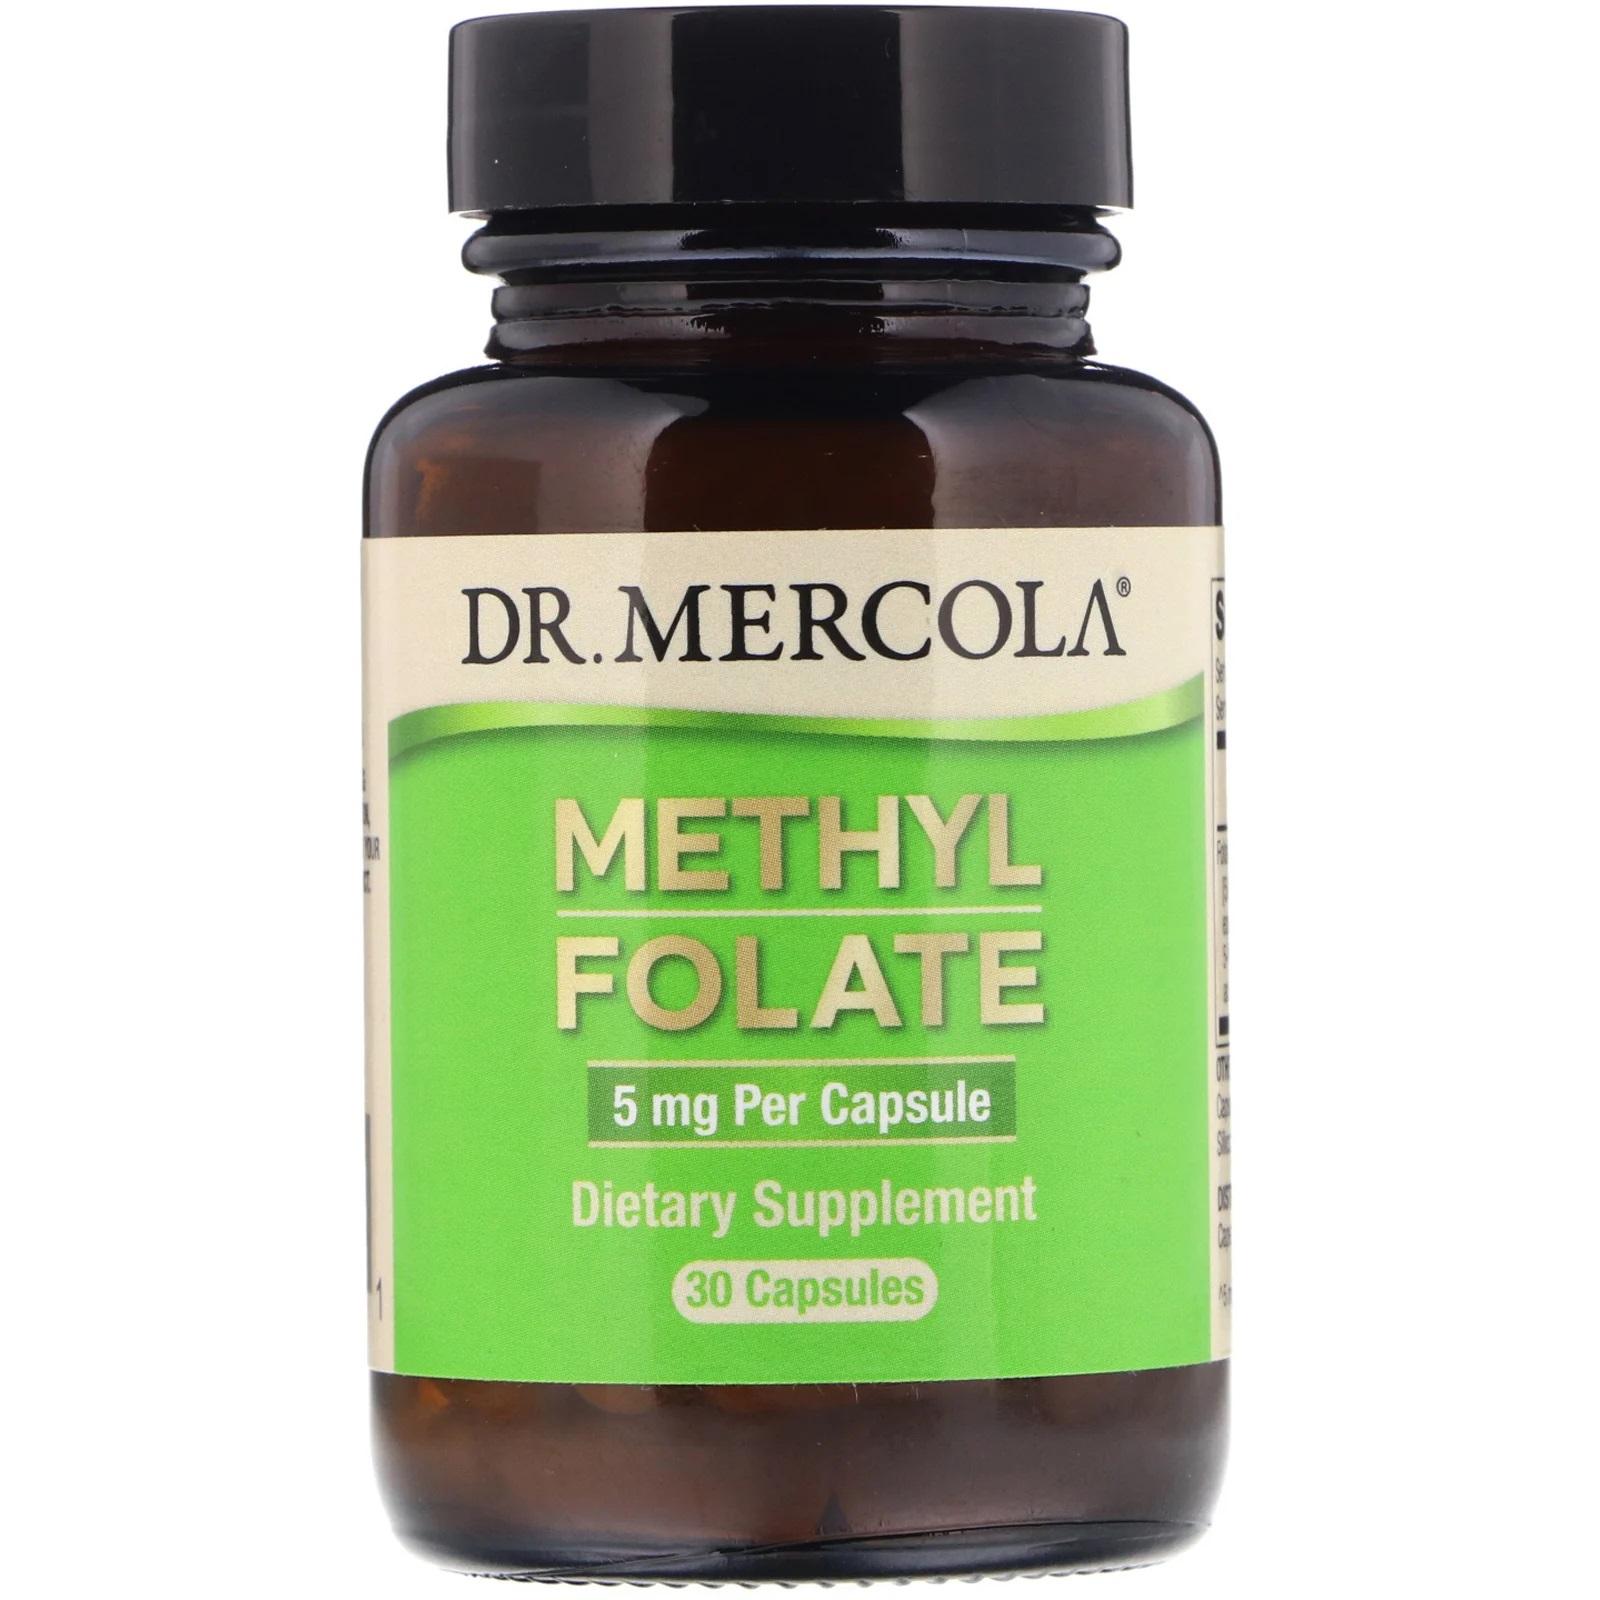 Image of Folate 5 mg 30 Capsules - Dr. Mercola 0810487030861